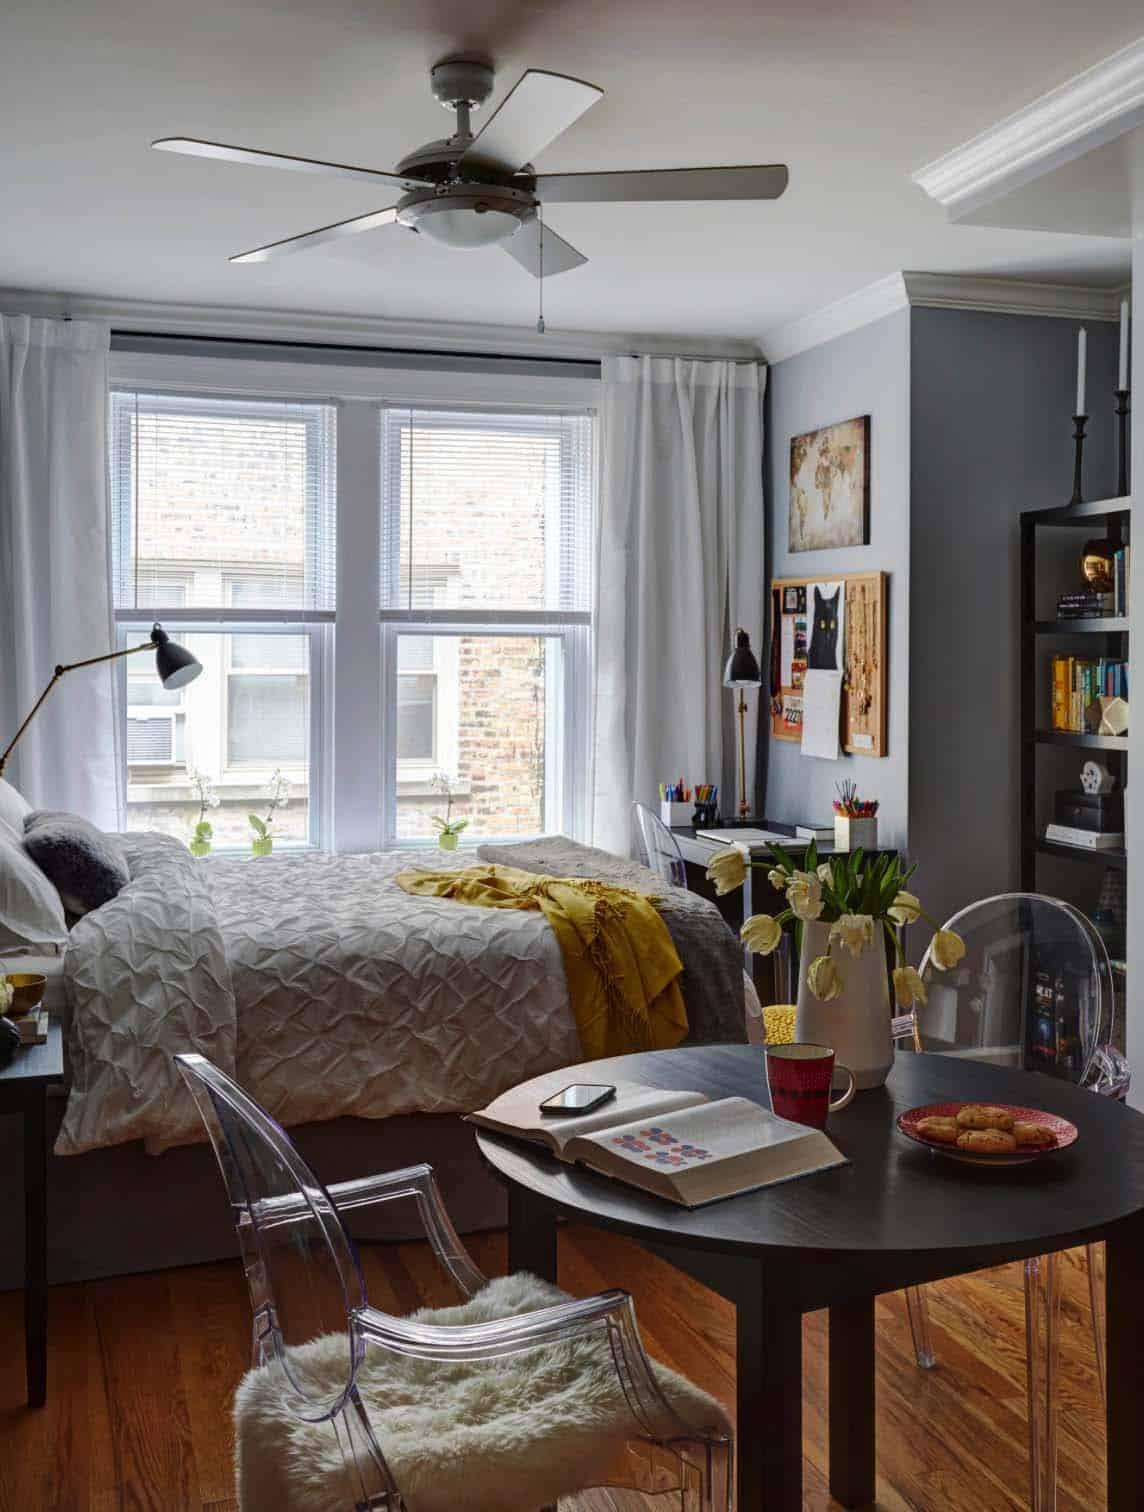 30+ Small yet amazingly cozy master bedroom retreats on Master Bedroom Ideas  id=27329